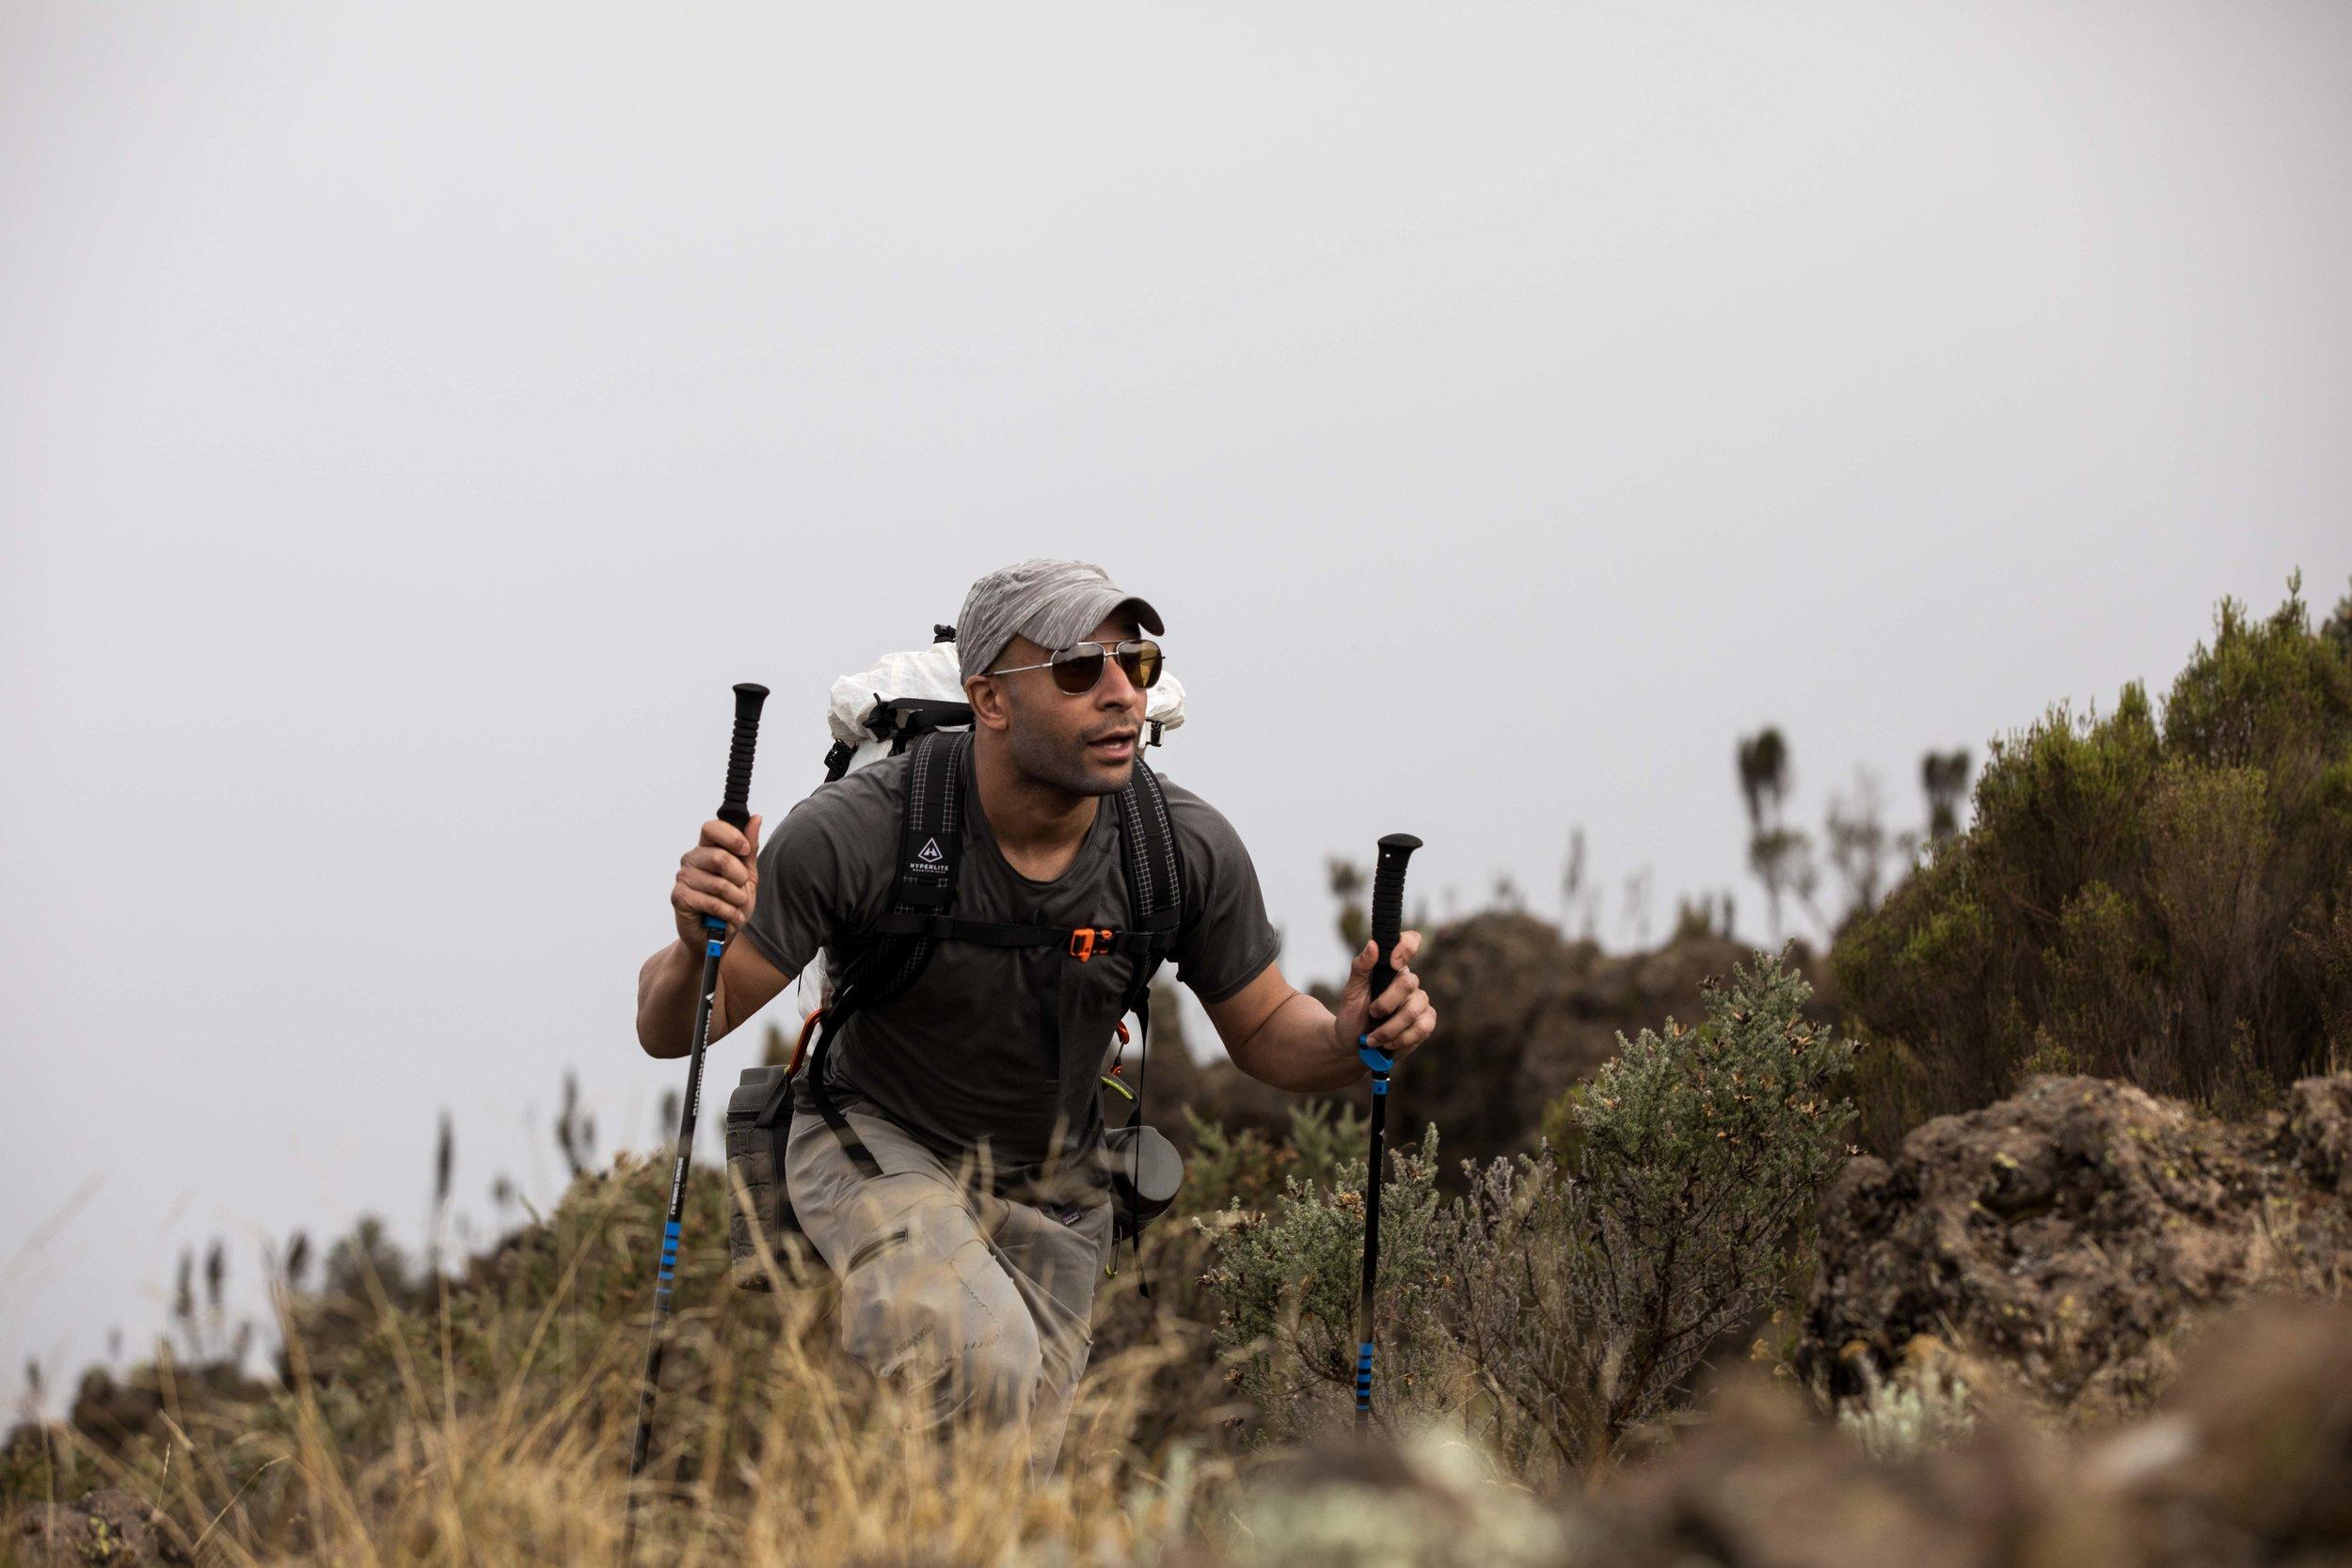 ajw_REI_Kilimanjaro-15.jpg